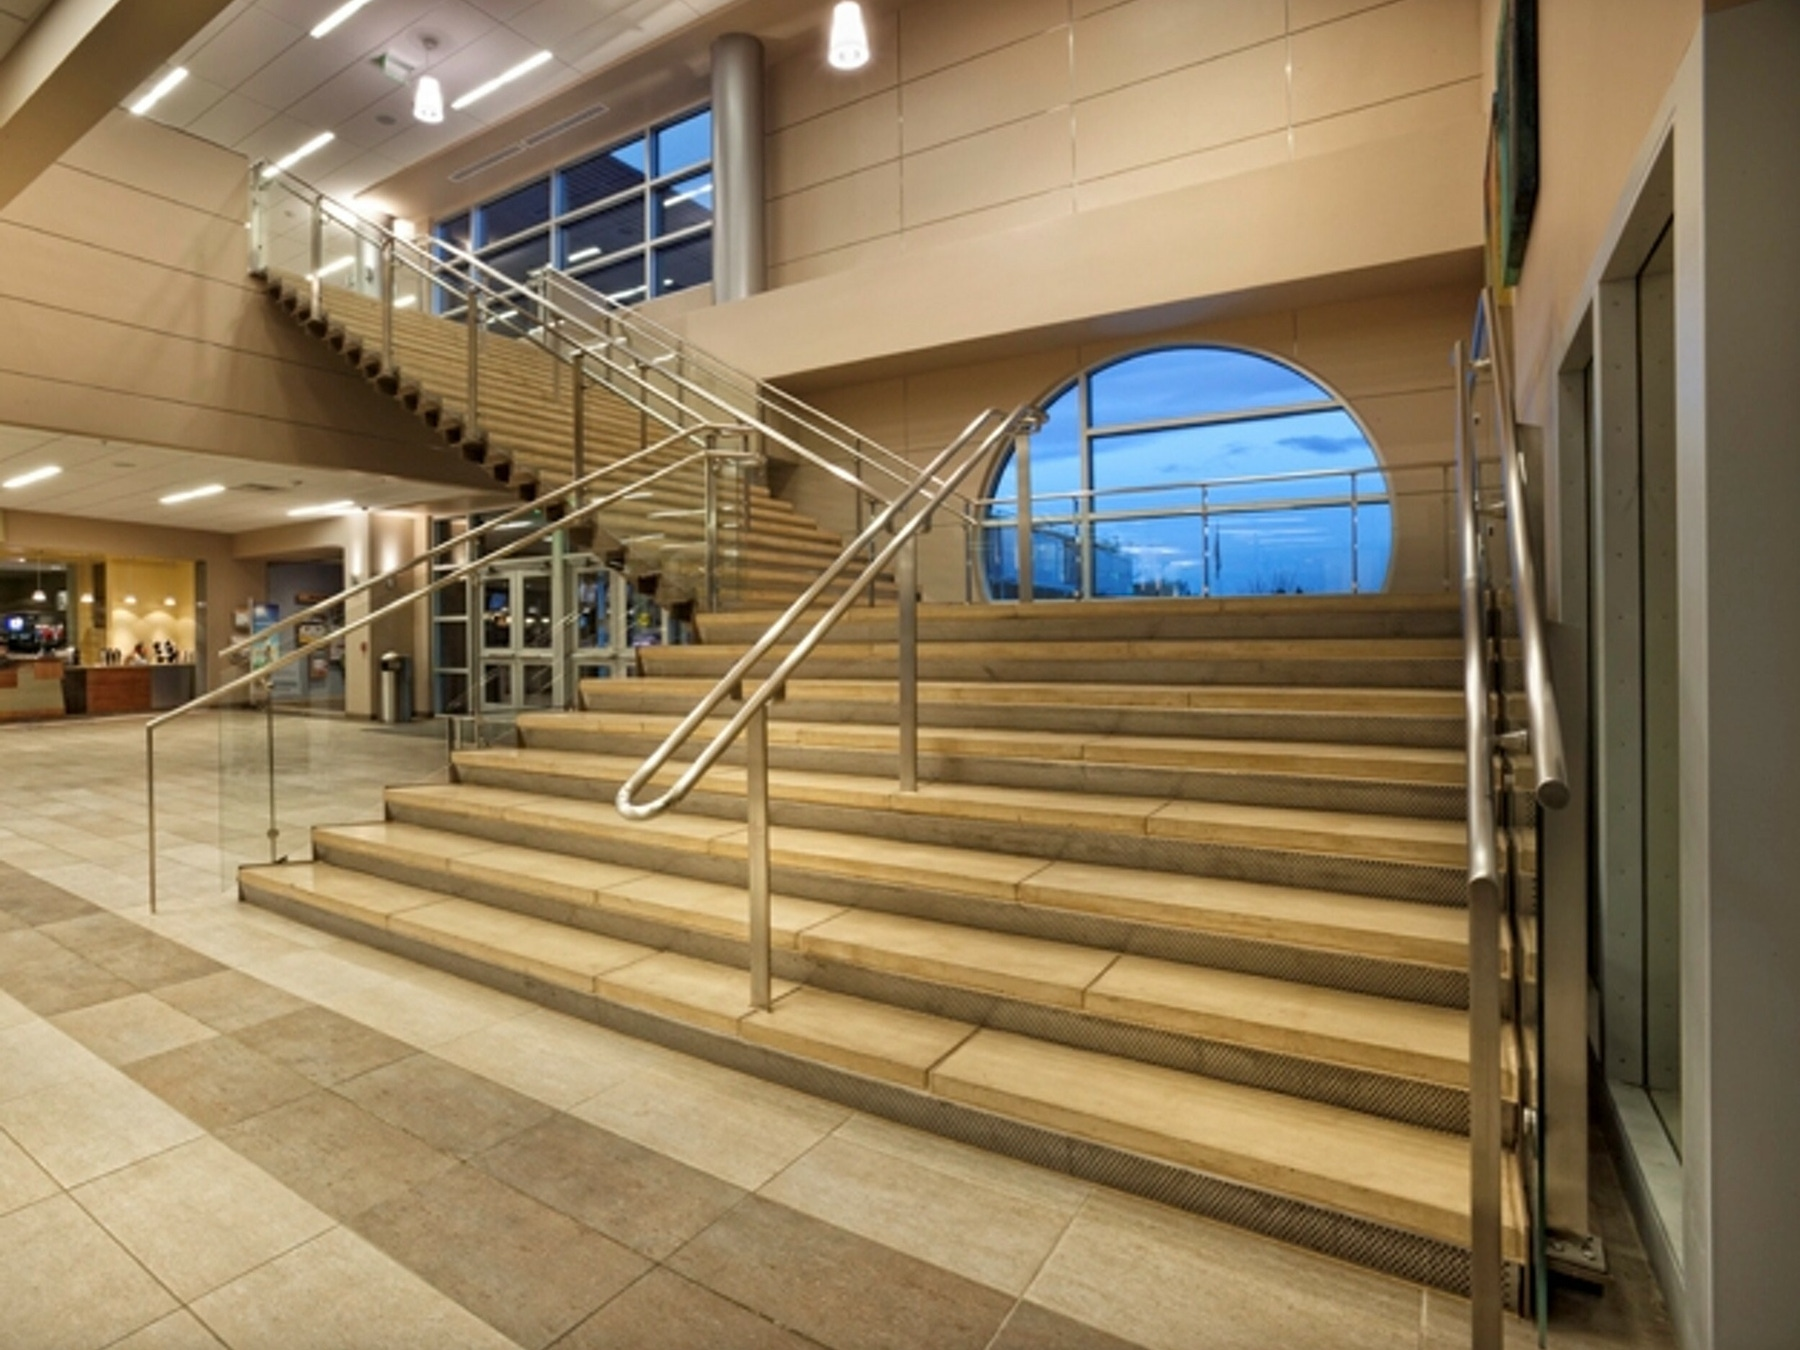 MSC Student Center Interior 012